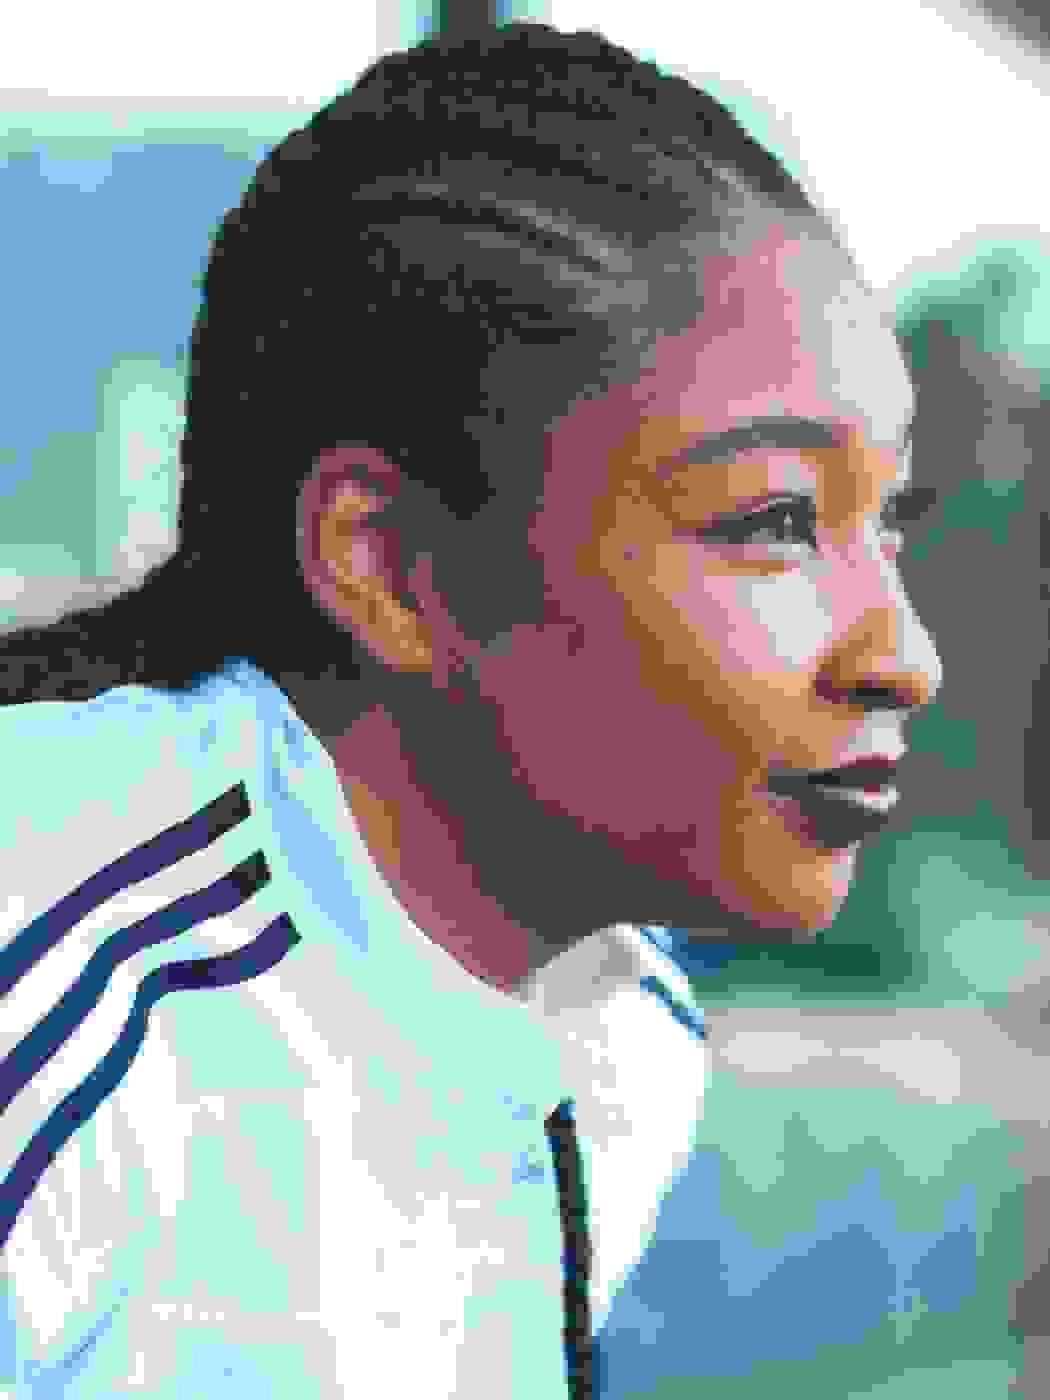 An image showing a portrait of Monica Okoye